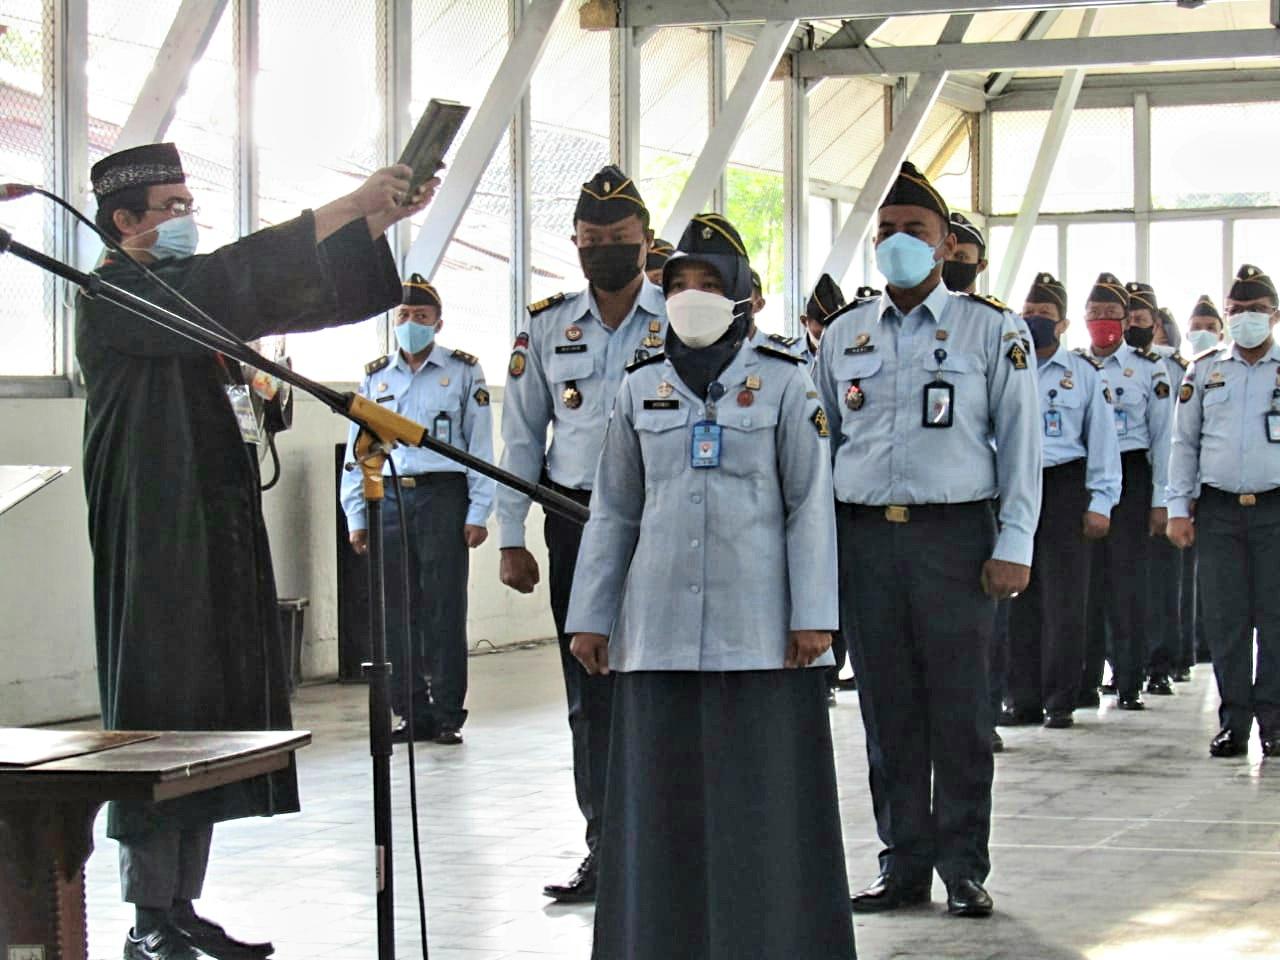 Onitawati Meraih Jabatan Perawat Ahli Muda di Lapas Yogyakarta